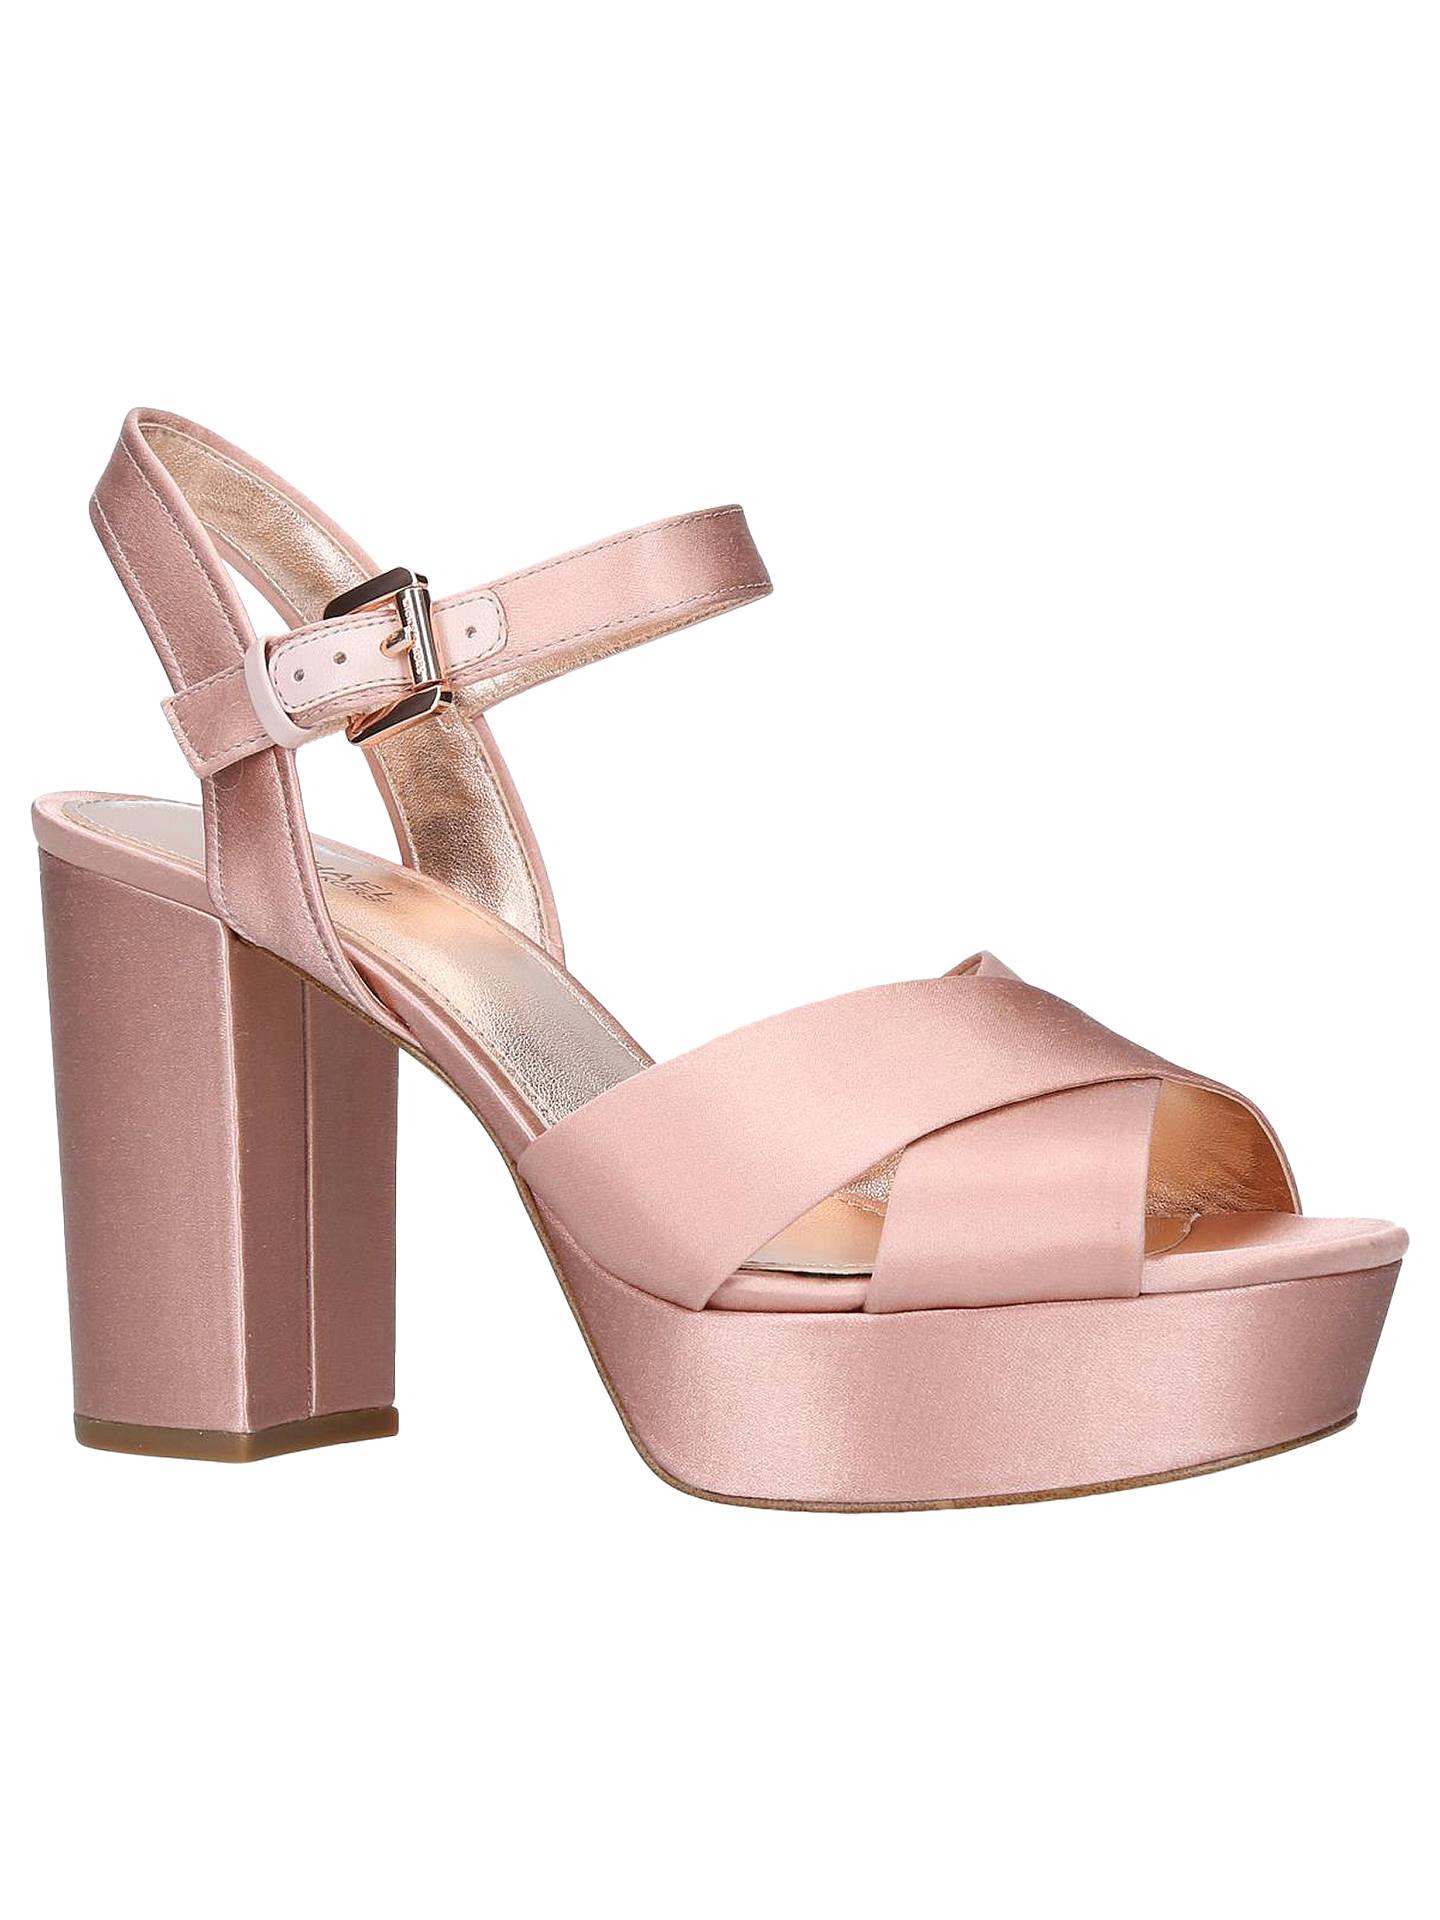 c1510912f91 Buy MICHAEL Michael Kors Divia Block Heel Platform Sandals